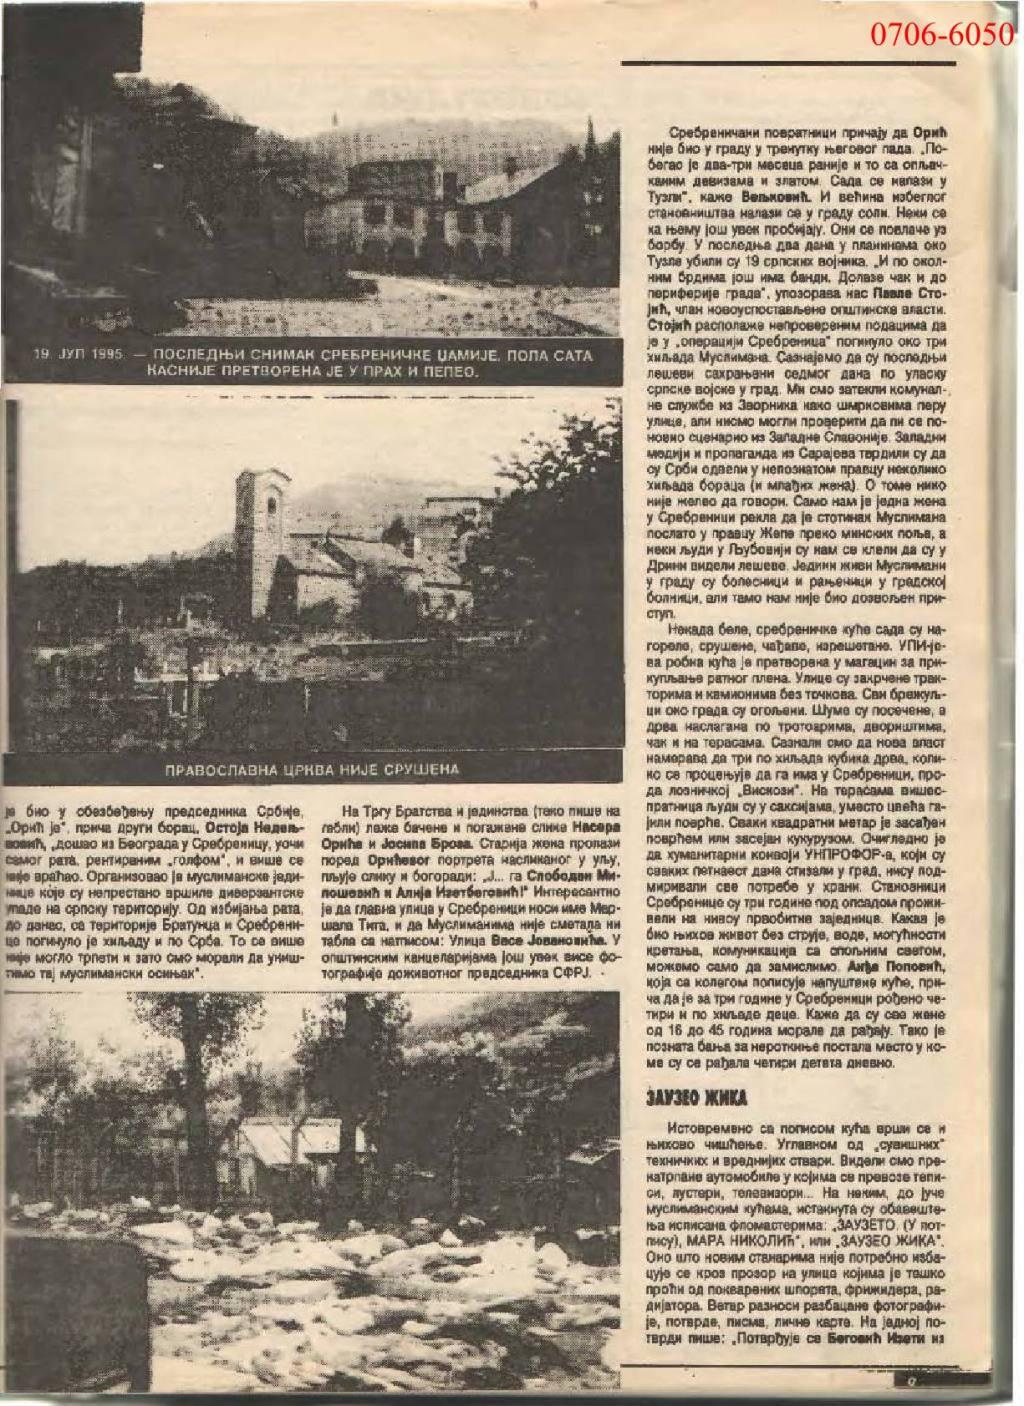 On the spot: A ghost town, Srebrenica: 'Return to the Nemanjids', Περιοδικό 'Srpska rec' του Βελιγραδίου, τχ #129, άρθρο του φωτογράφου Dordo Vukoje και του δημοσιογράφου Aleksandar Cotric.